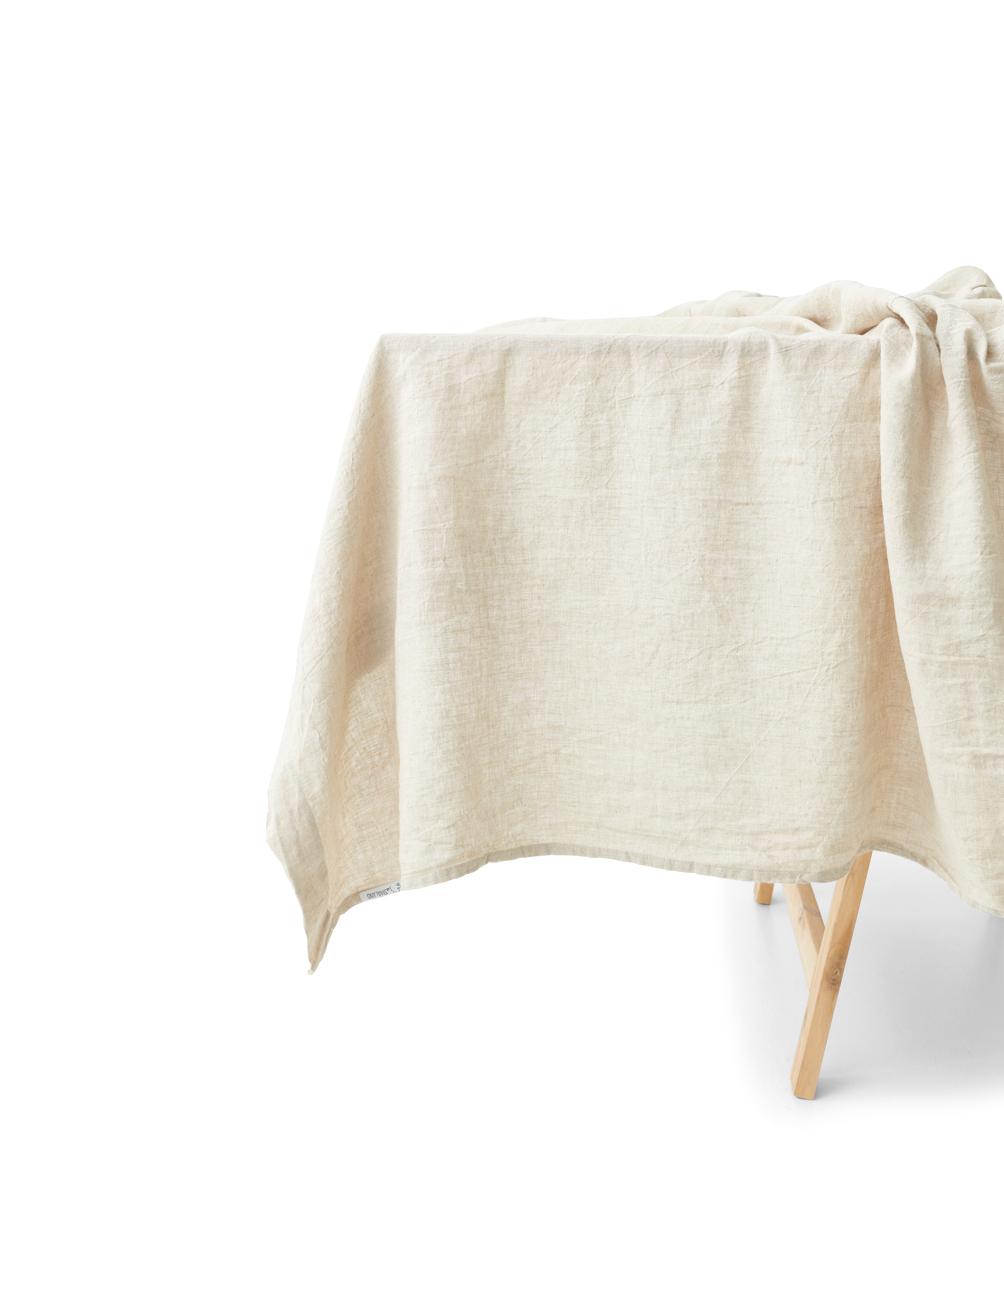 Tabelcloth Linen Natural